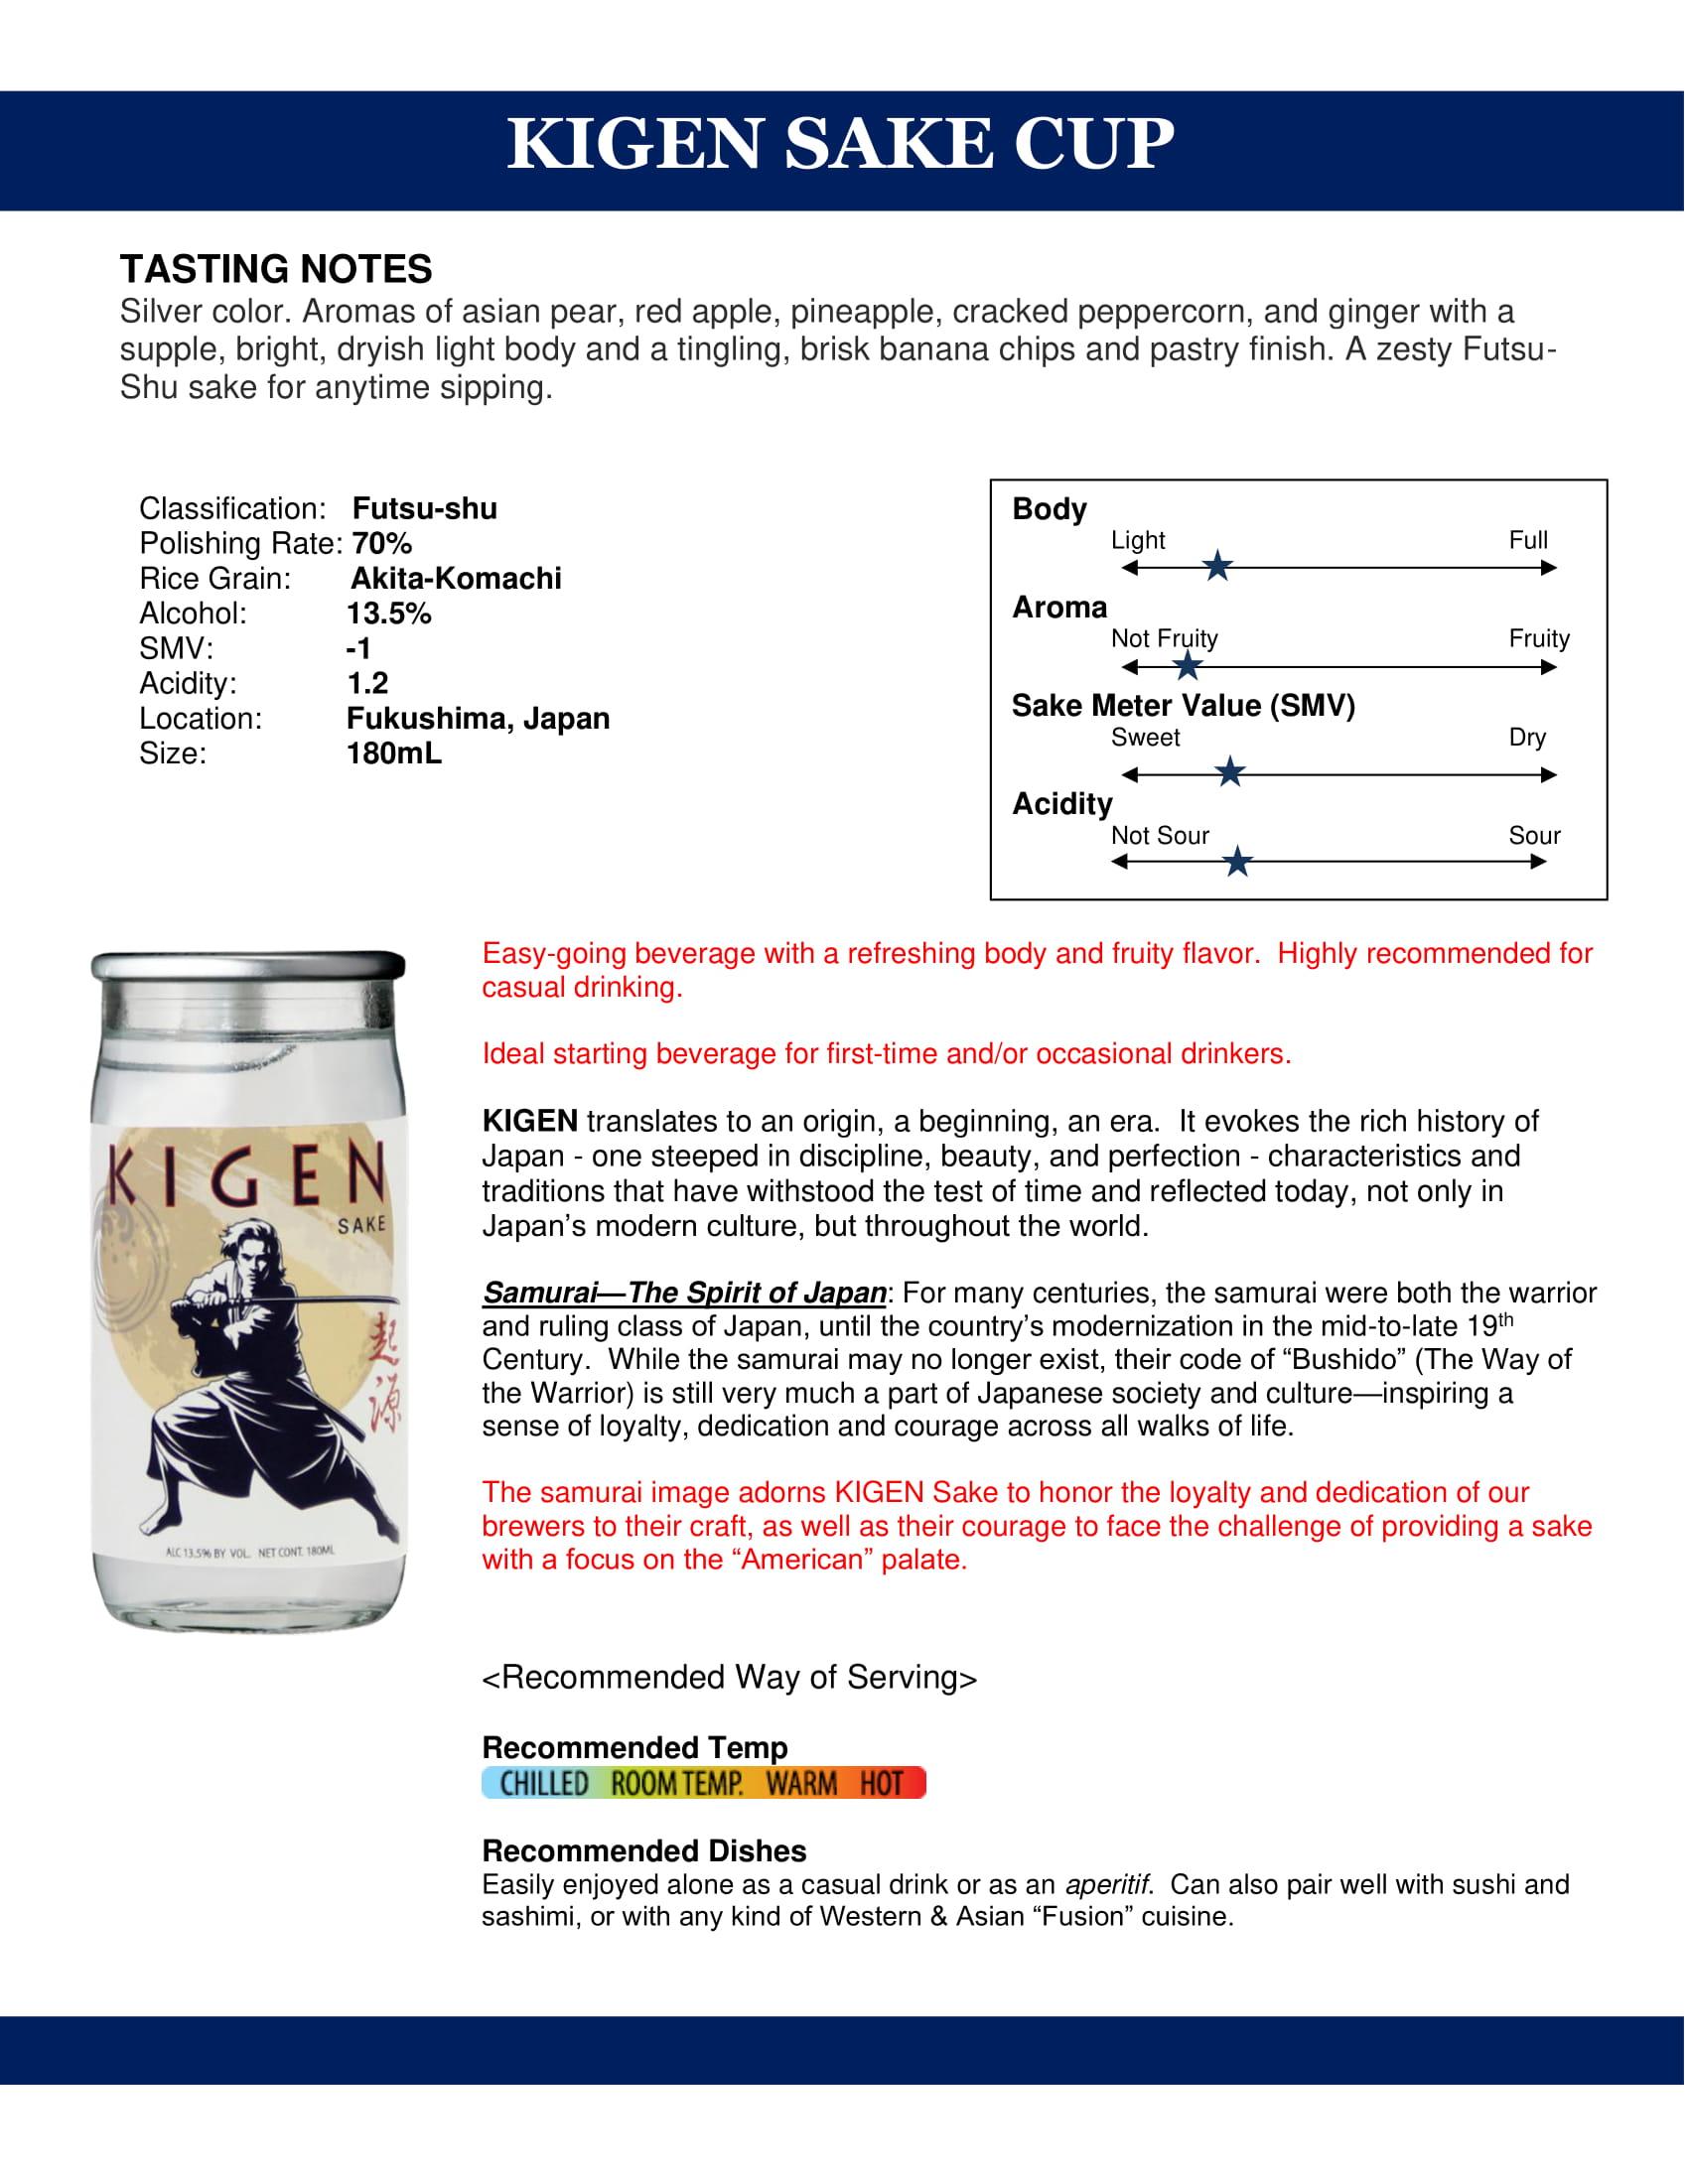 Kigen Sake Cup Tech Sheet